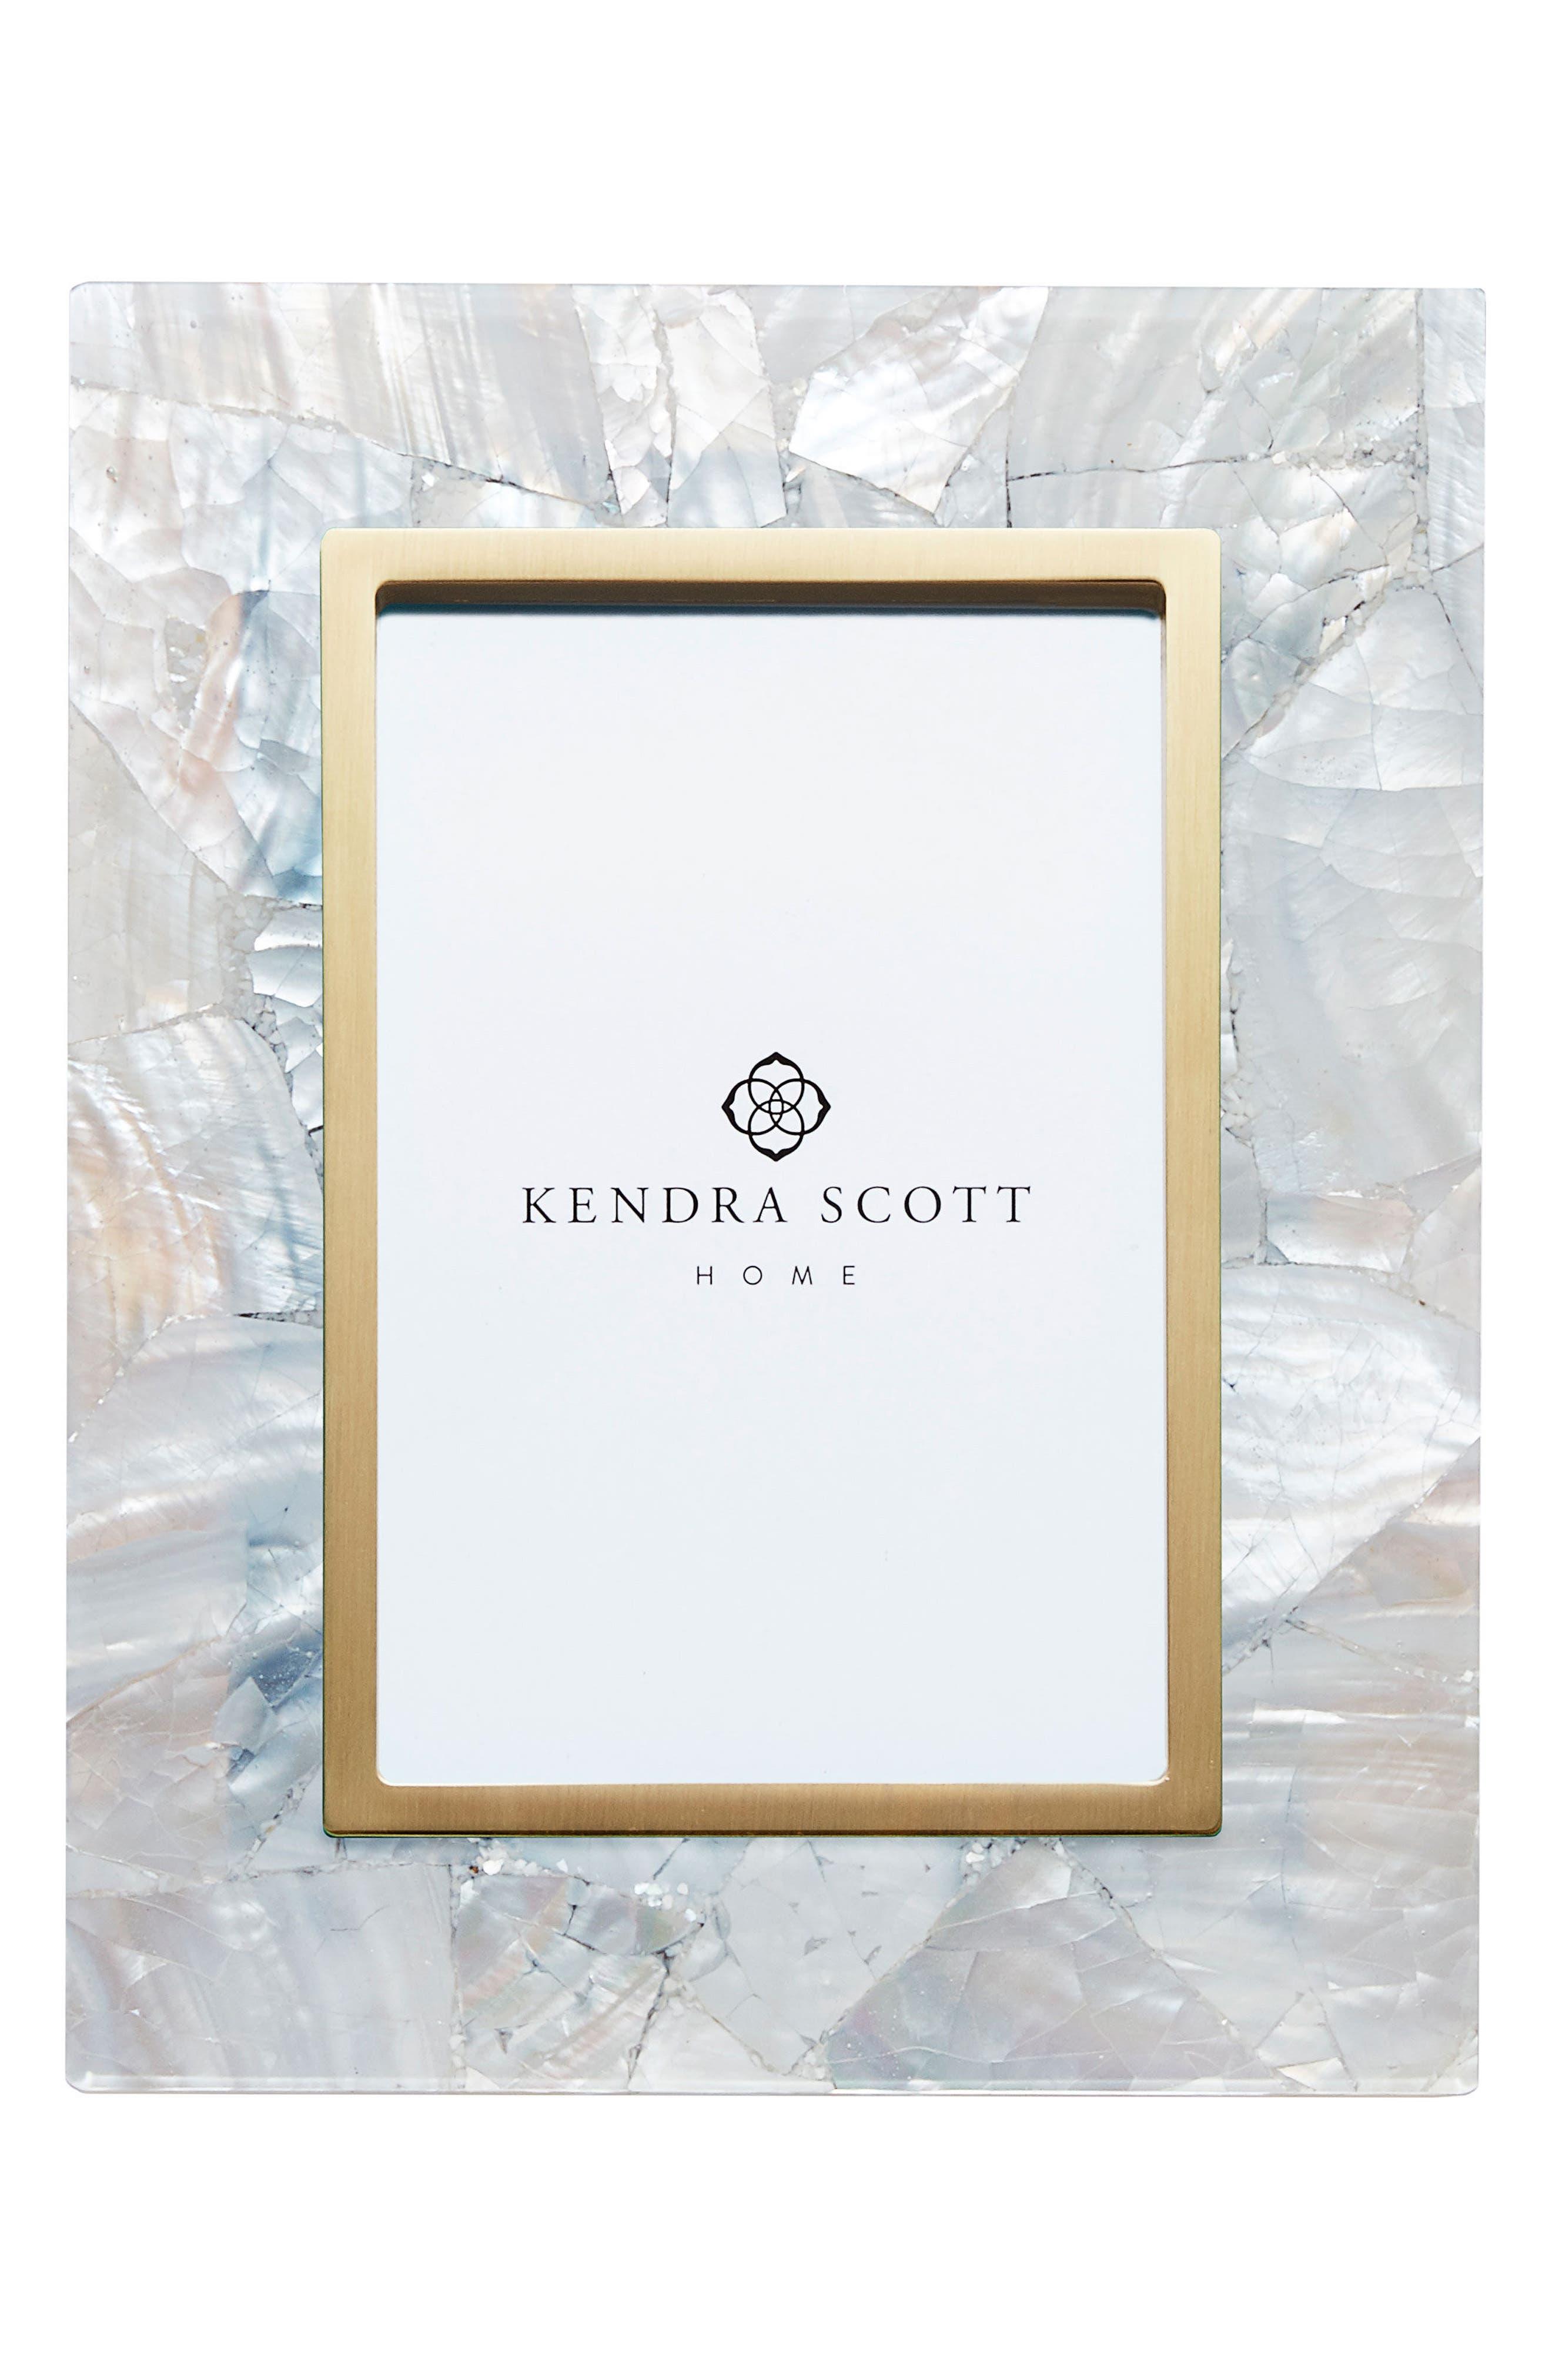 Kendra Scott Stone Slab Picture Frame